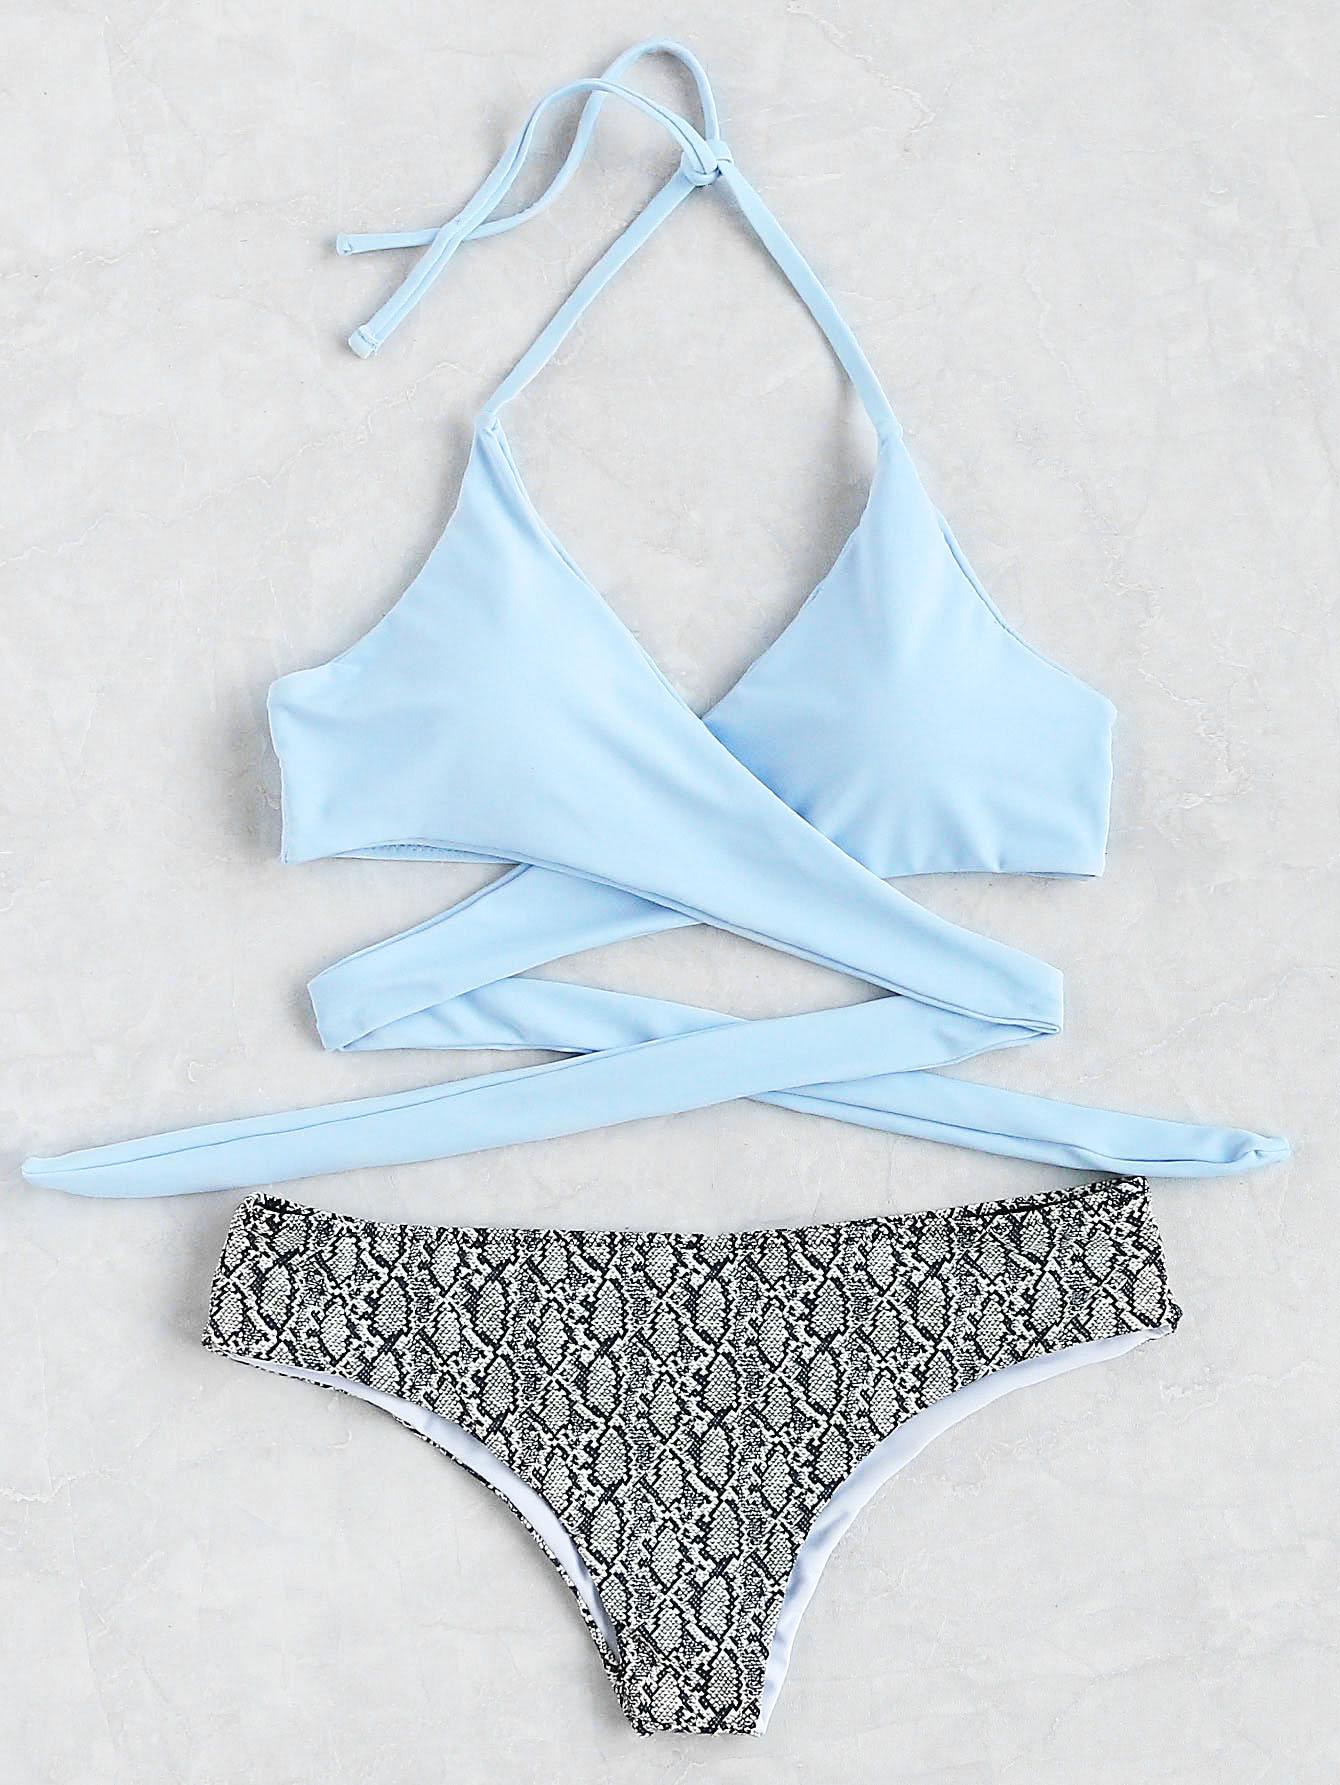 Snake Print Halter Wrap Knotted Back Bikini Set halter patterned wrap bikini